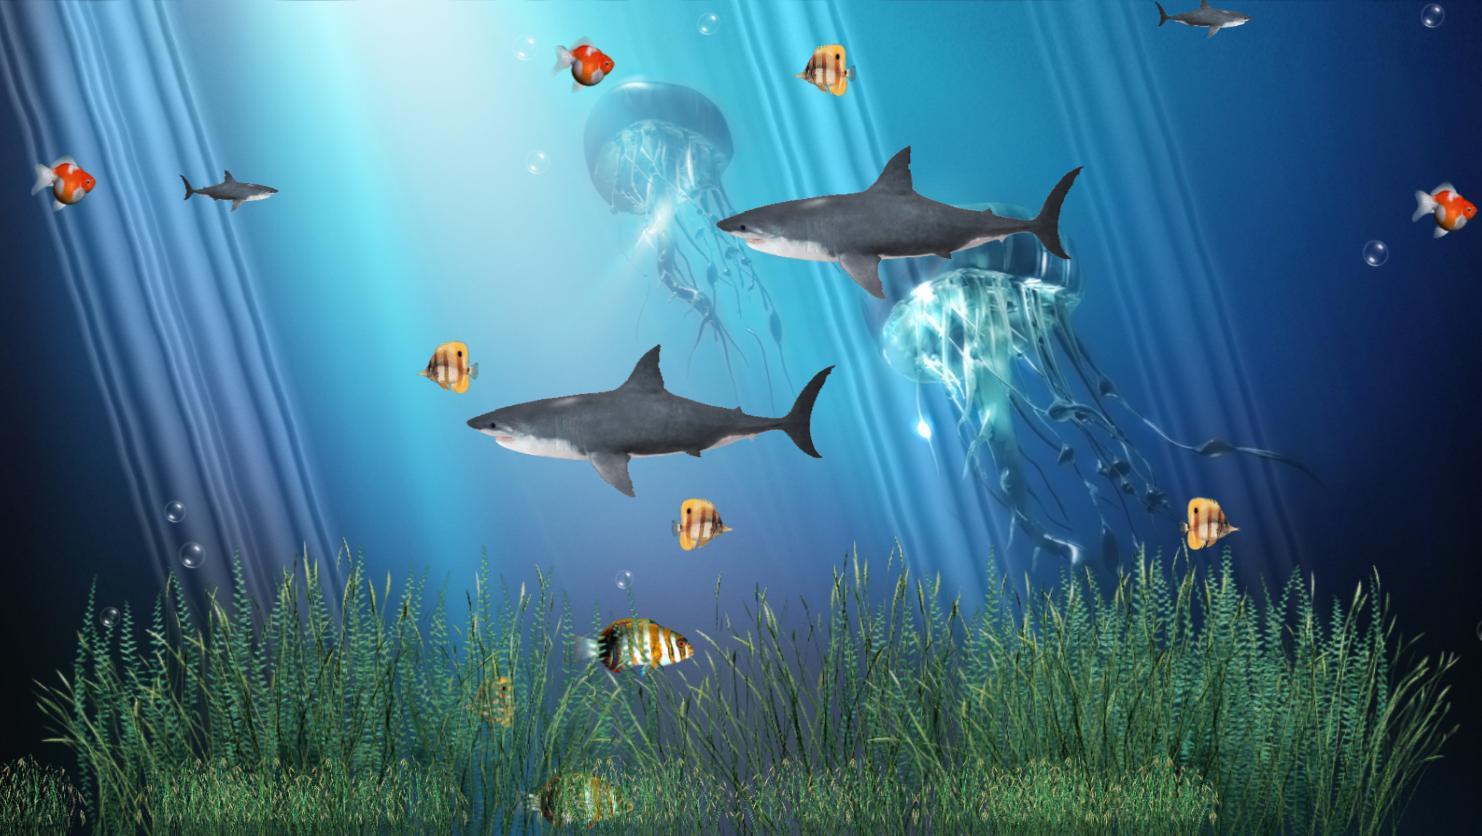 Fish Images Stock Photos amp Vectors  Shutterstock